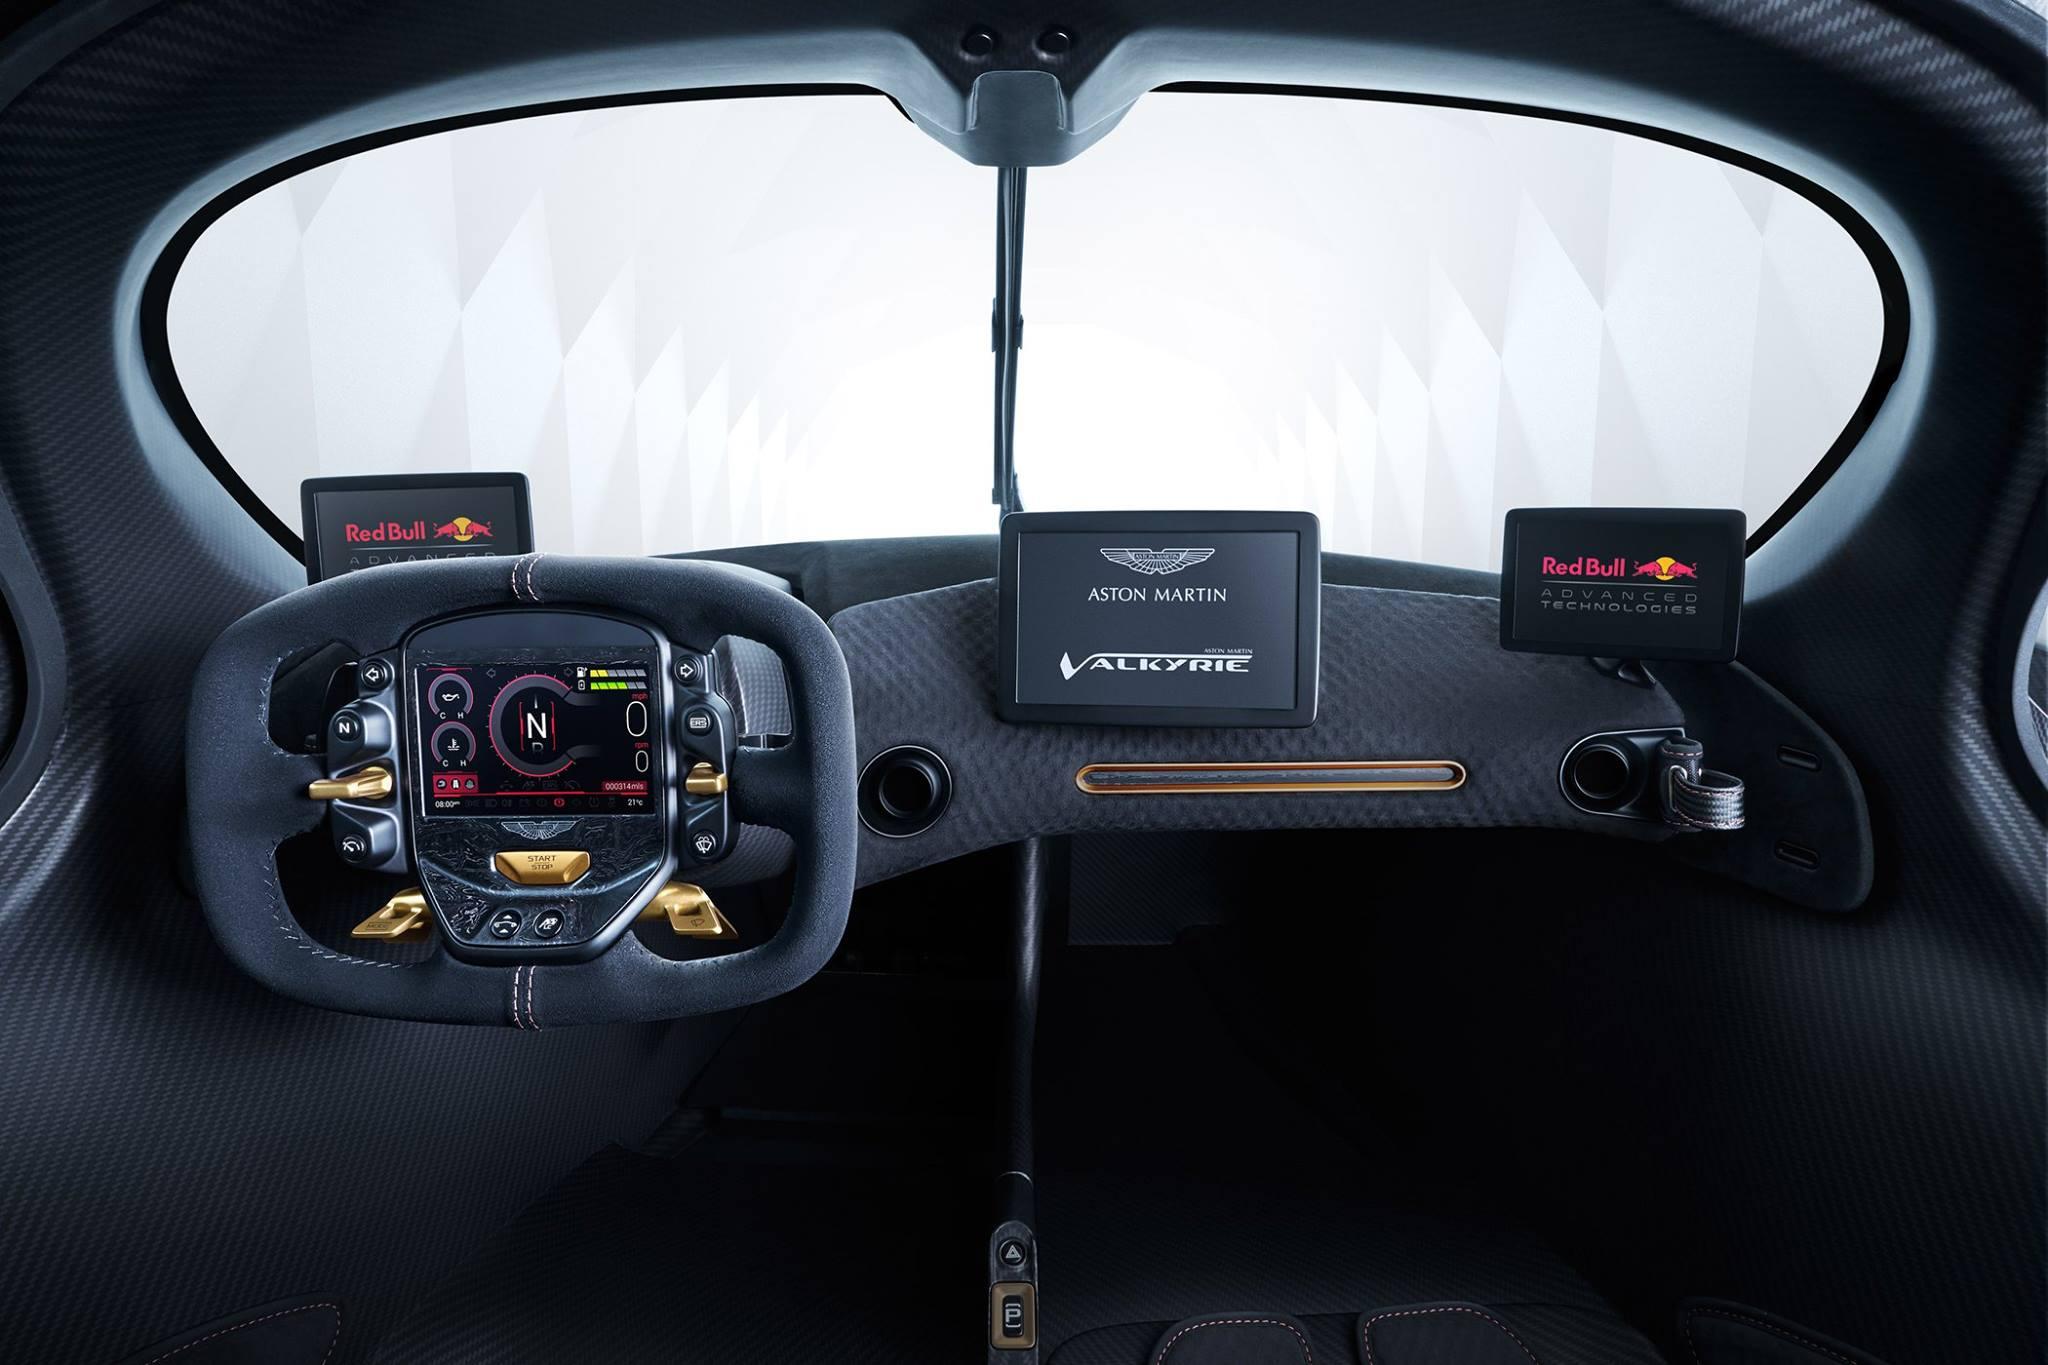 Aston-Martin-Valkyrie-Production-Version-8